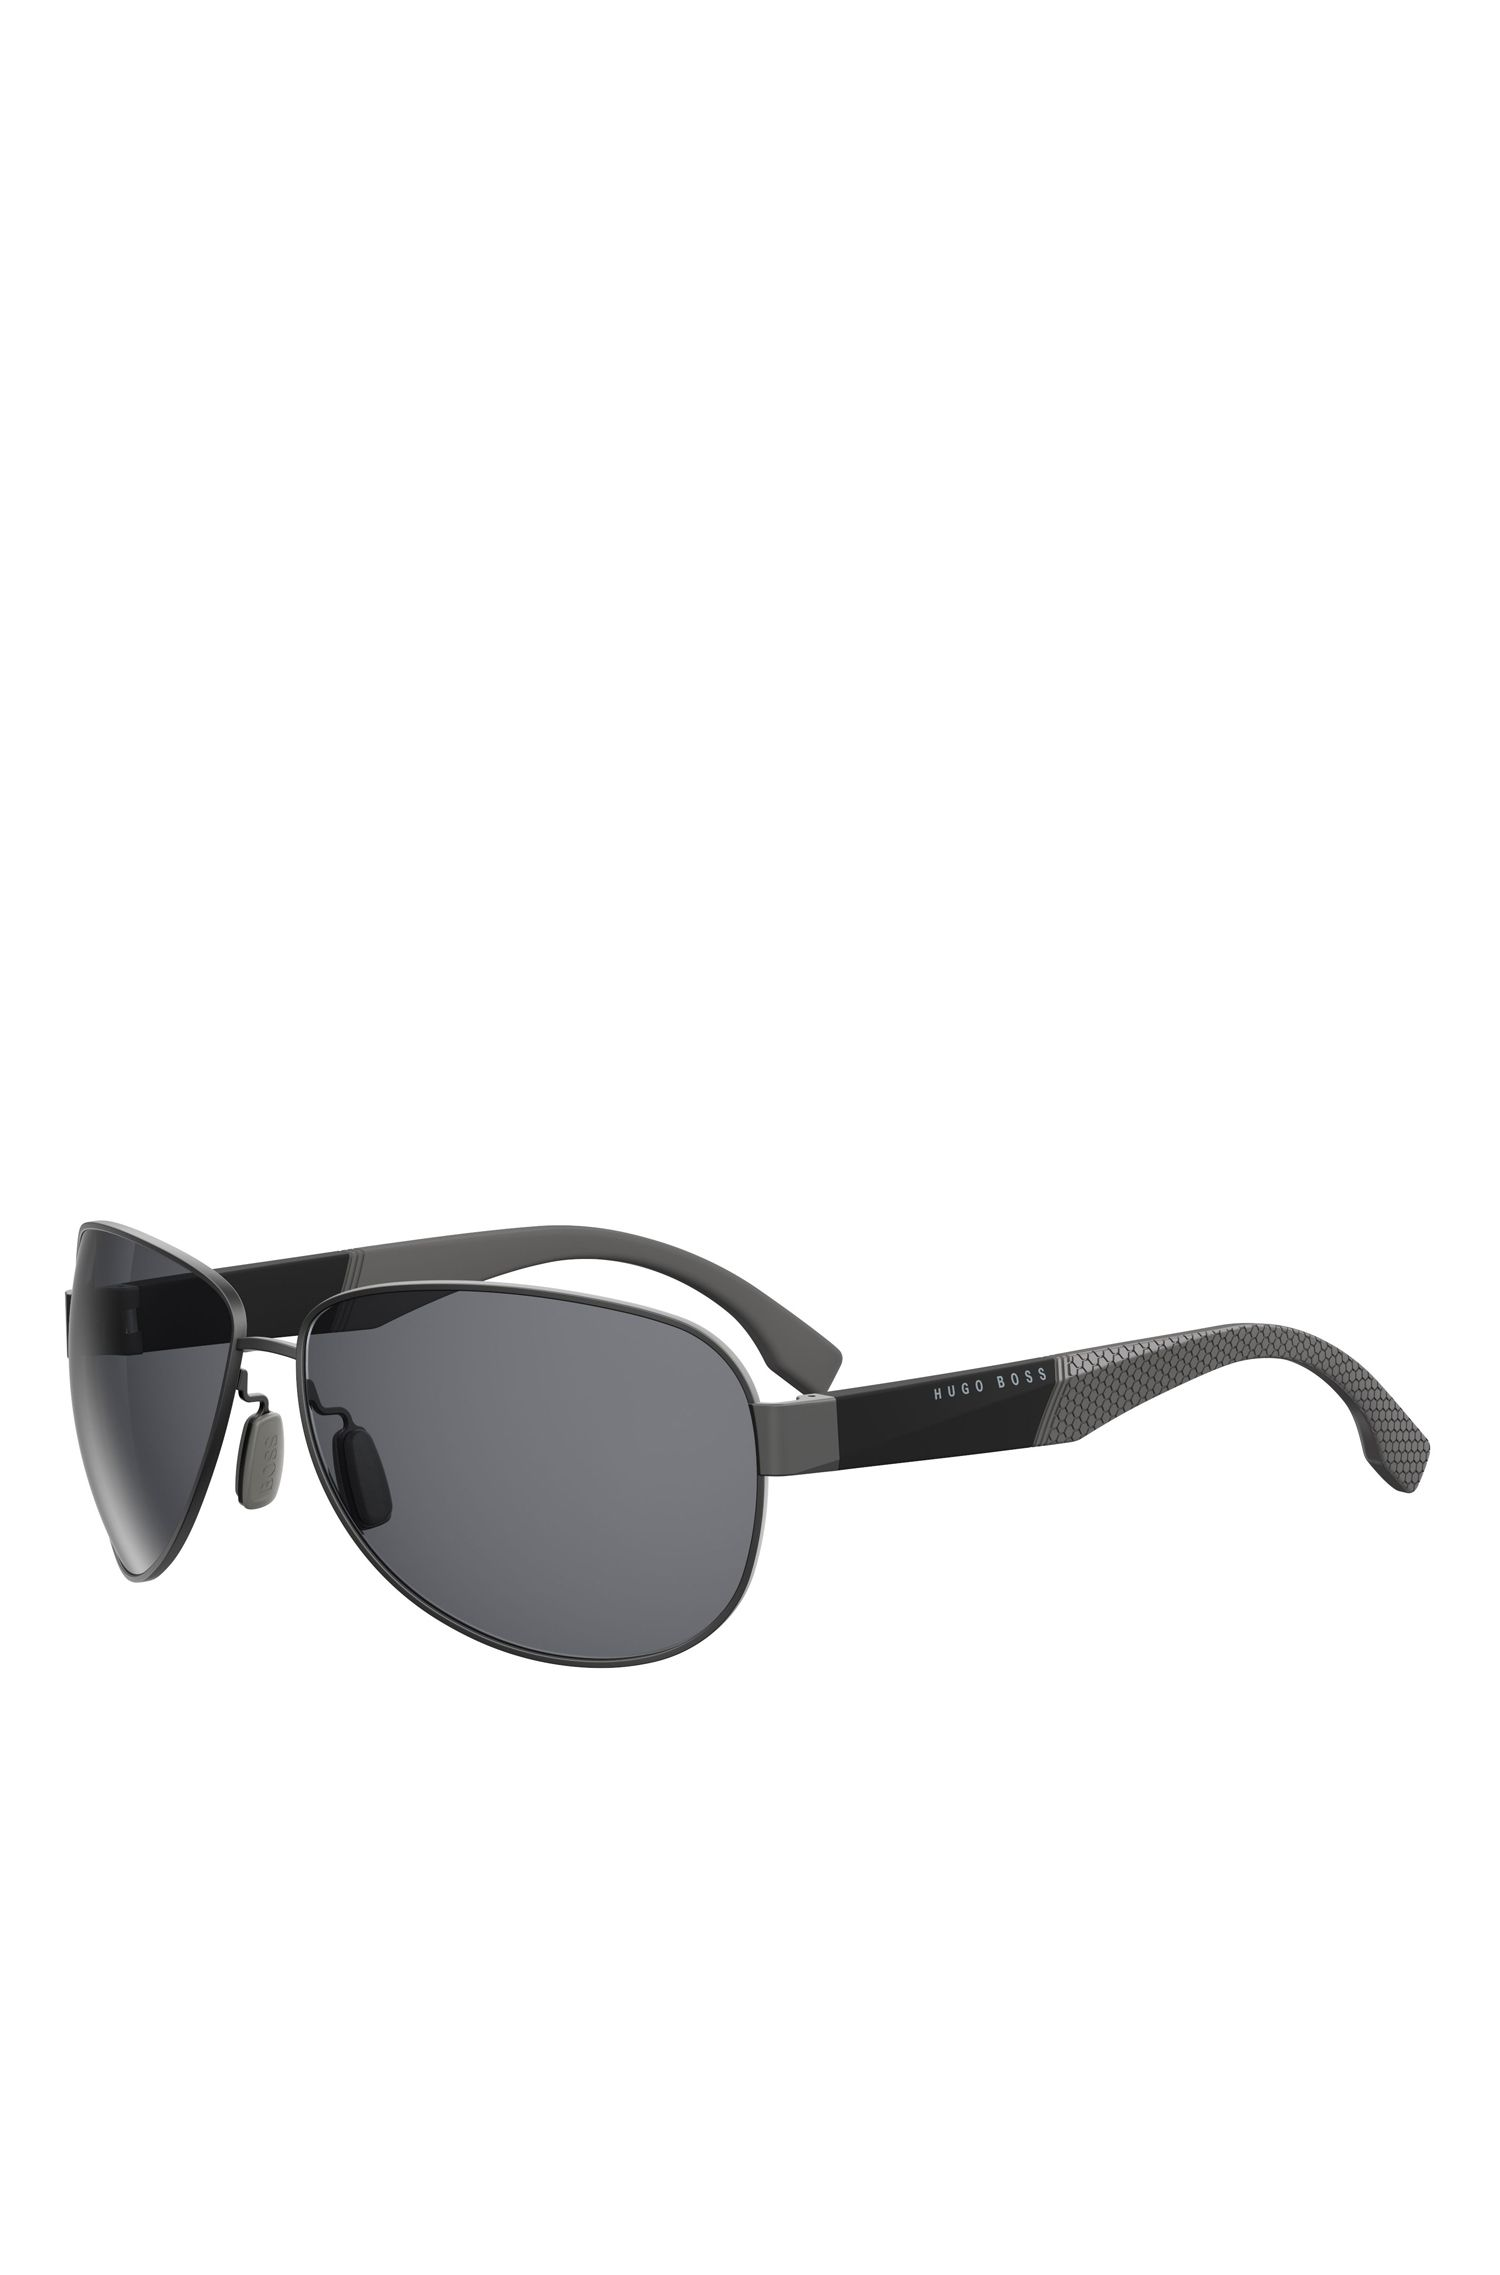 Black Aviator Sunglasses | BOSS 0915/S, Assorted-Pre-Pack